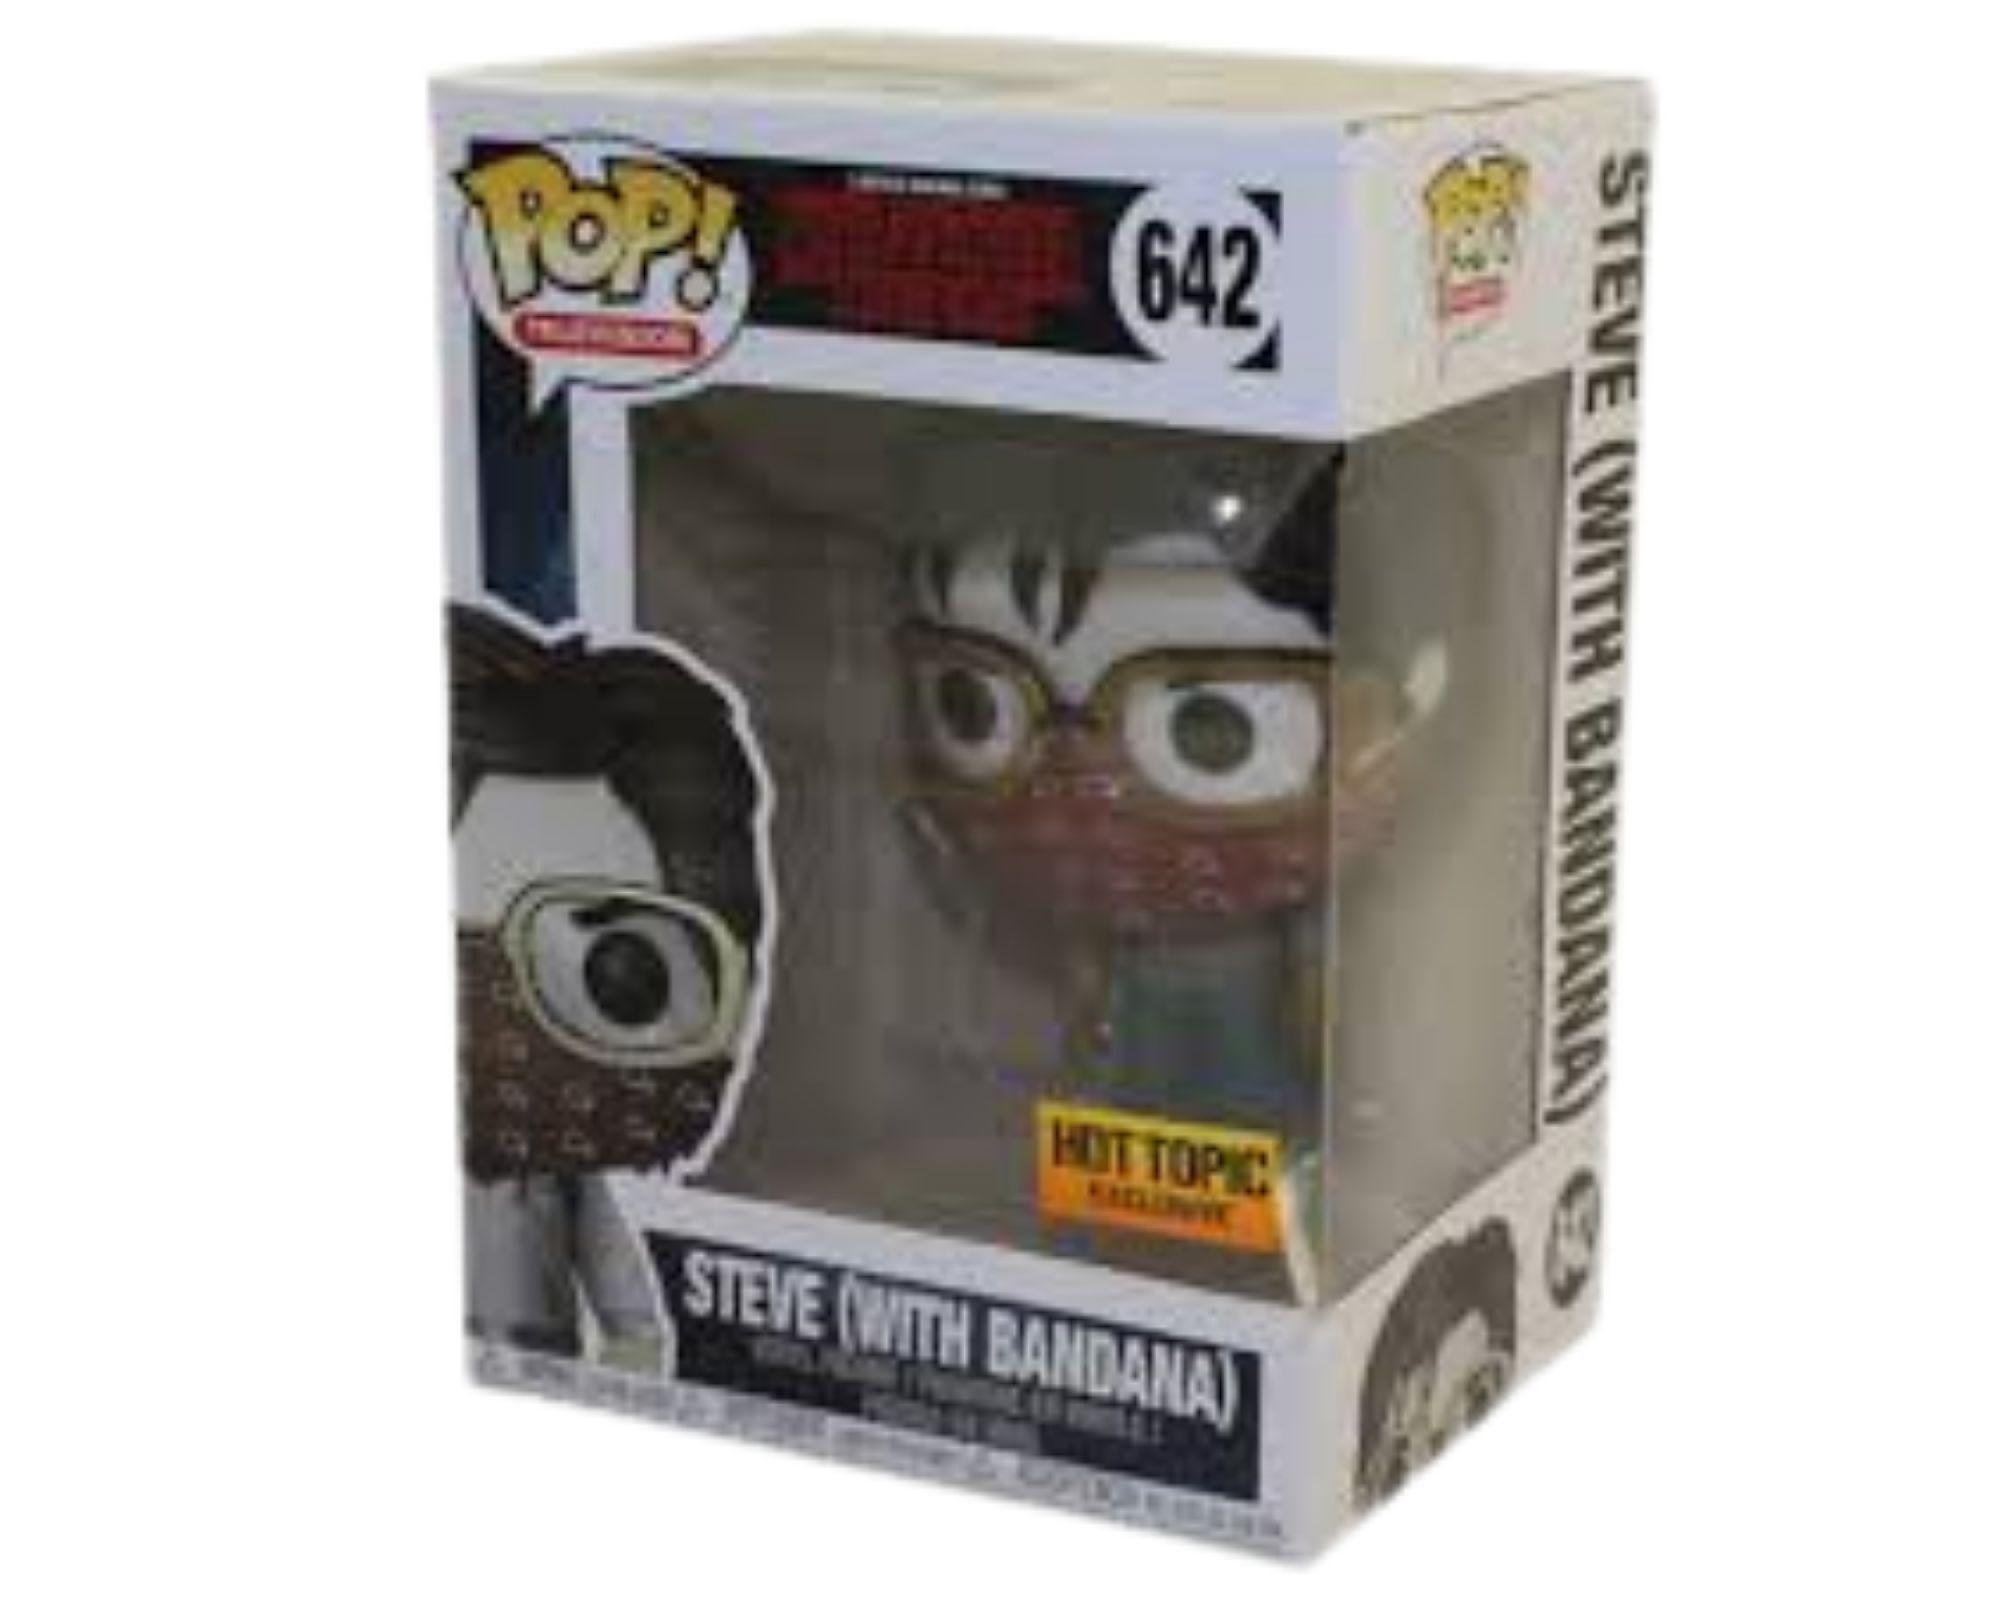 Funko Pop Stranger Things Steve with Bandana Hot Topic #642  - Game Land Brinquedos